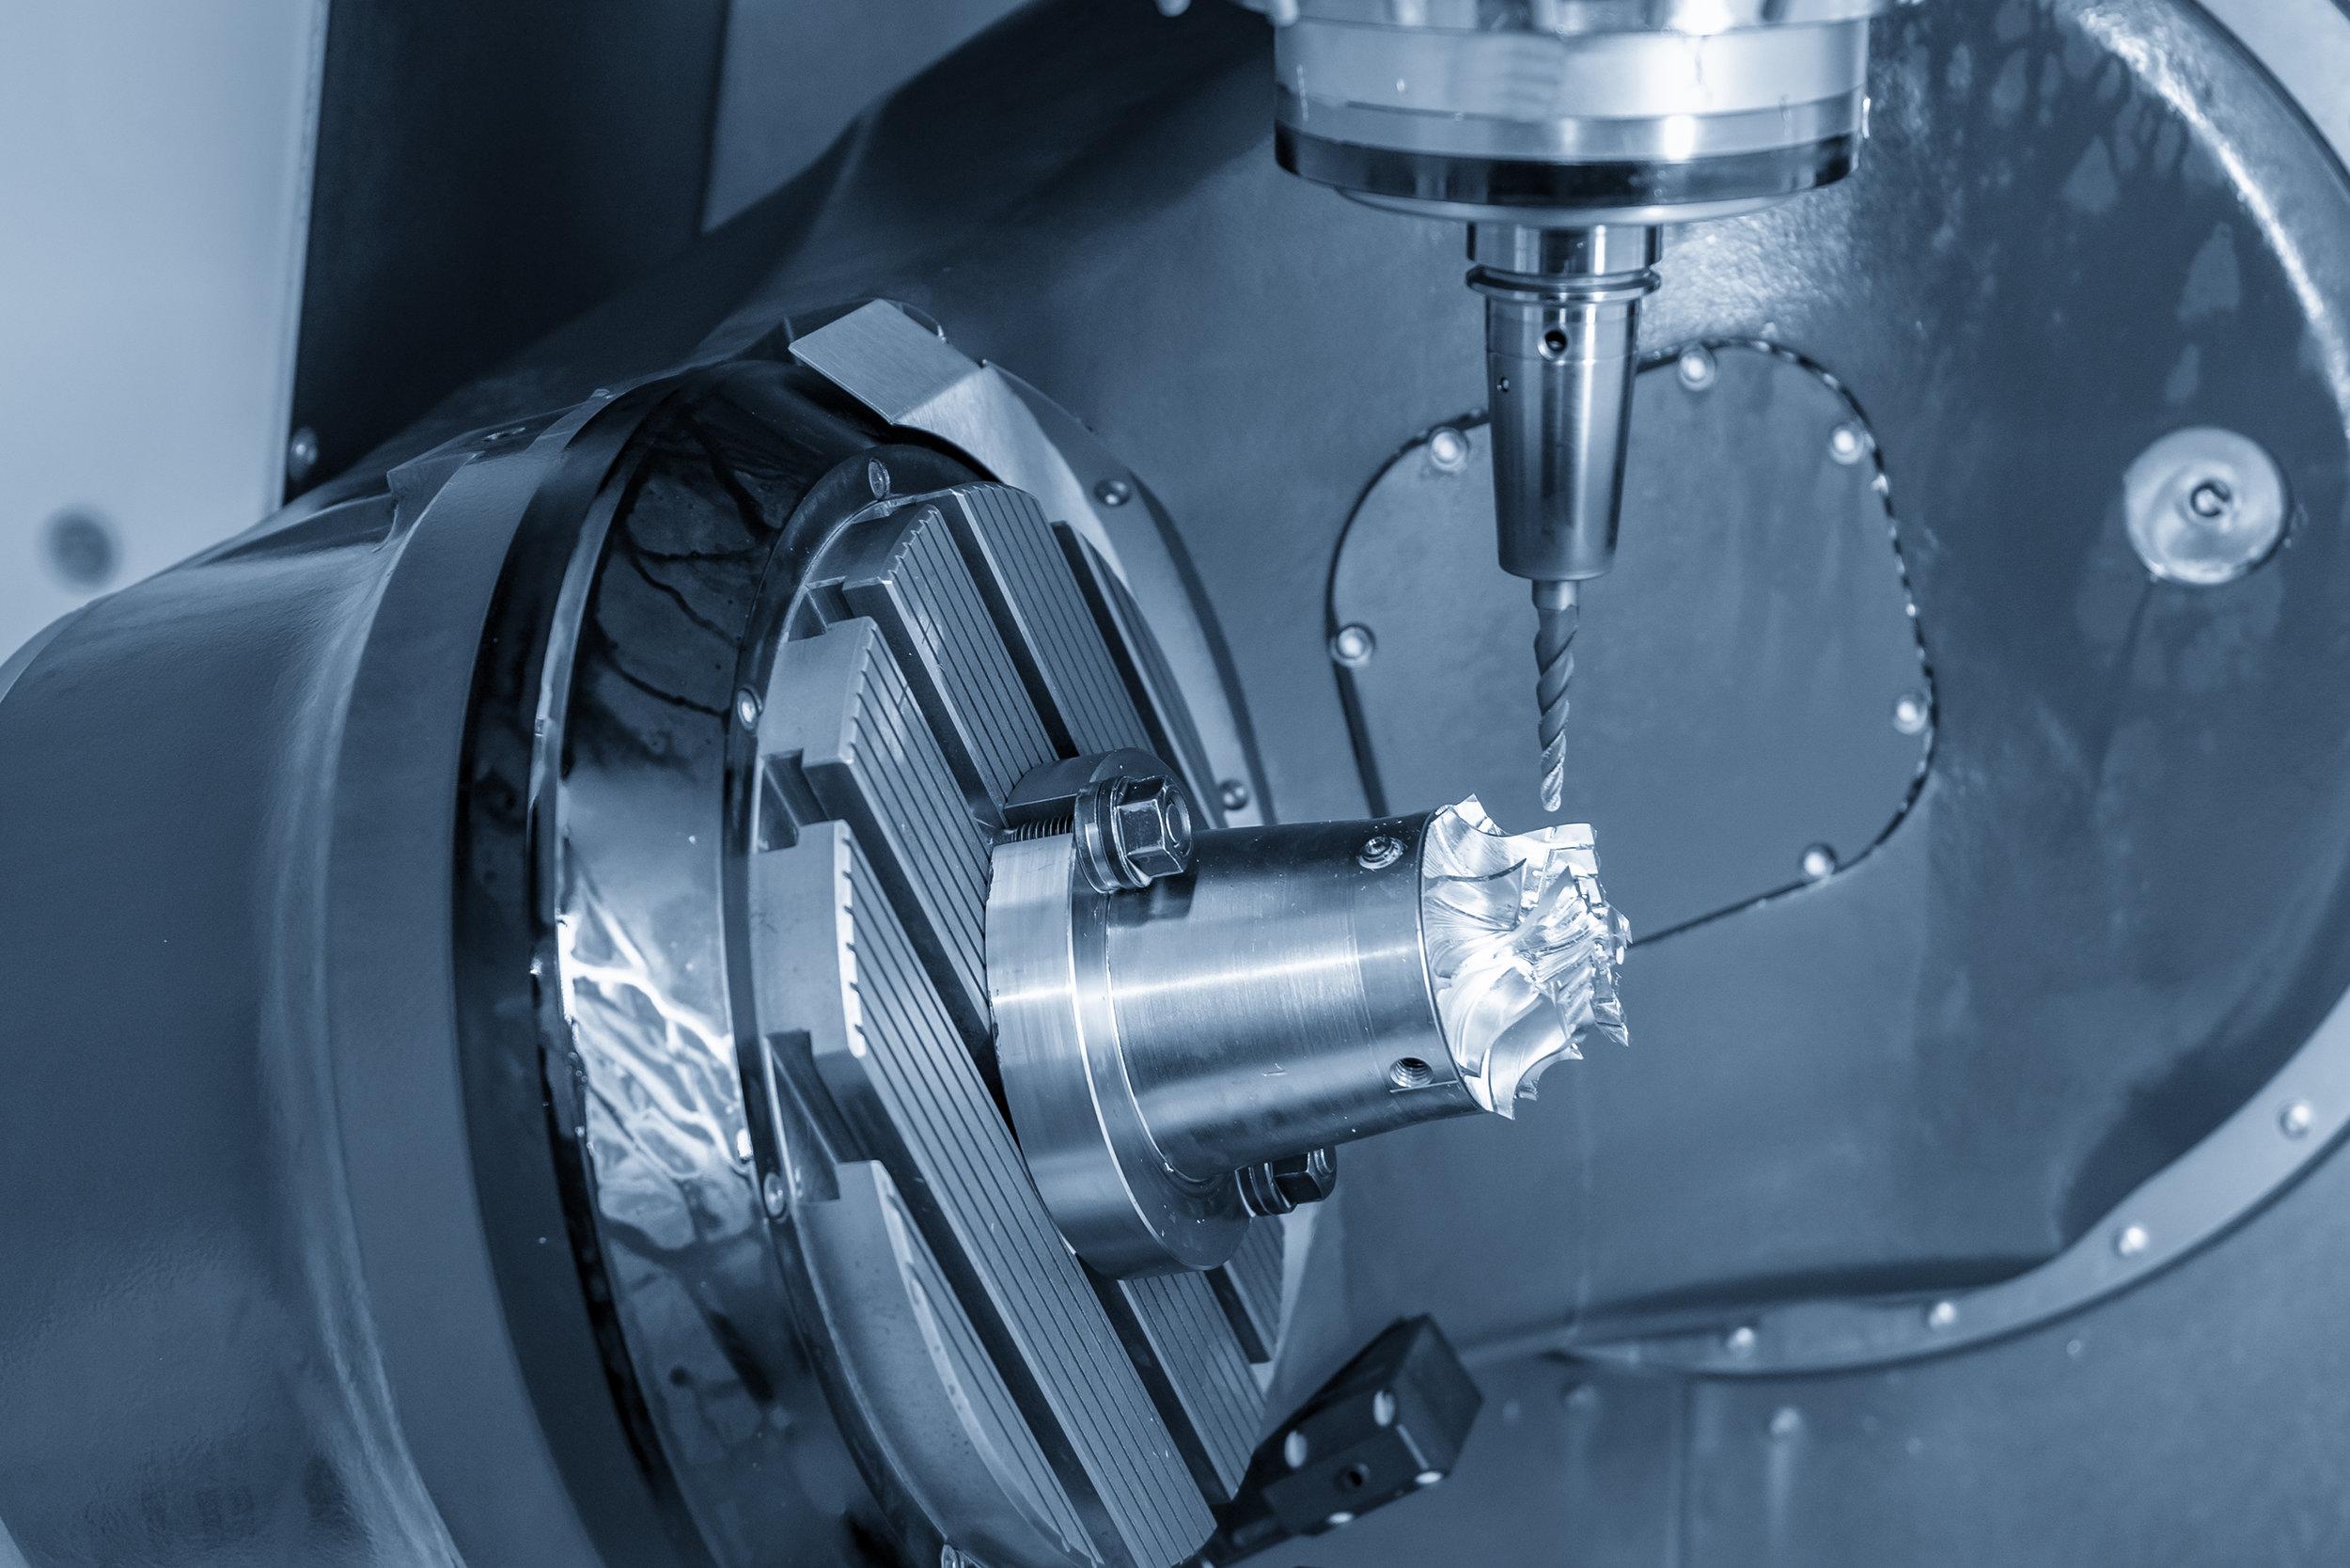 5-axis-turbine.jpg